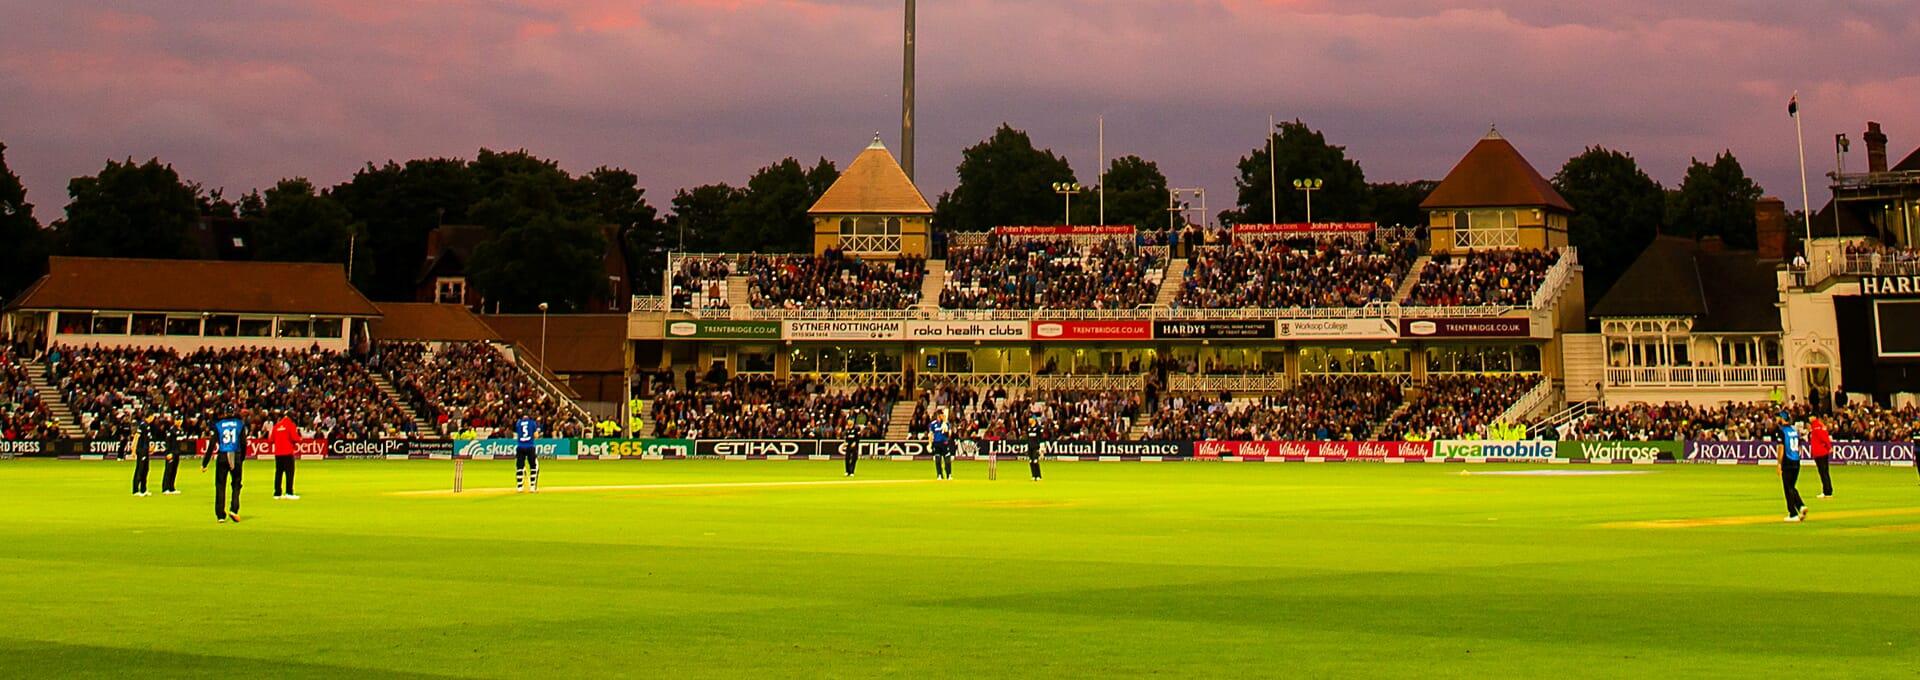 Trent Bridge VIP Cricket Hospitality Package